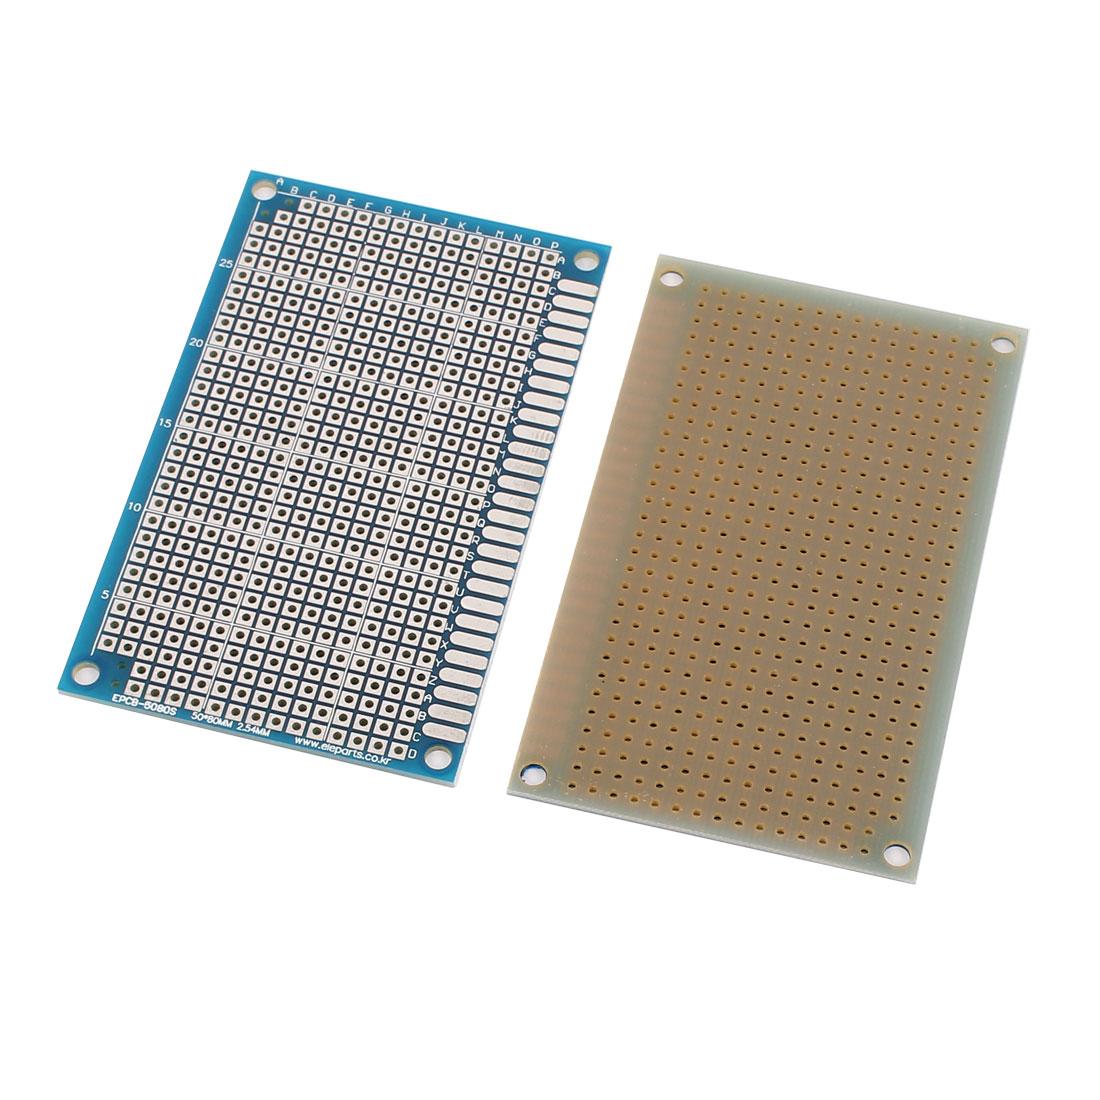 2 Pcs Single Sided Prototype Universal PCB Print Circuit Board 5 x 8CM Blue